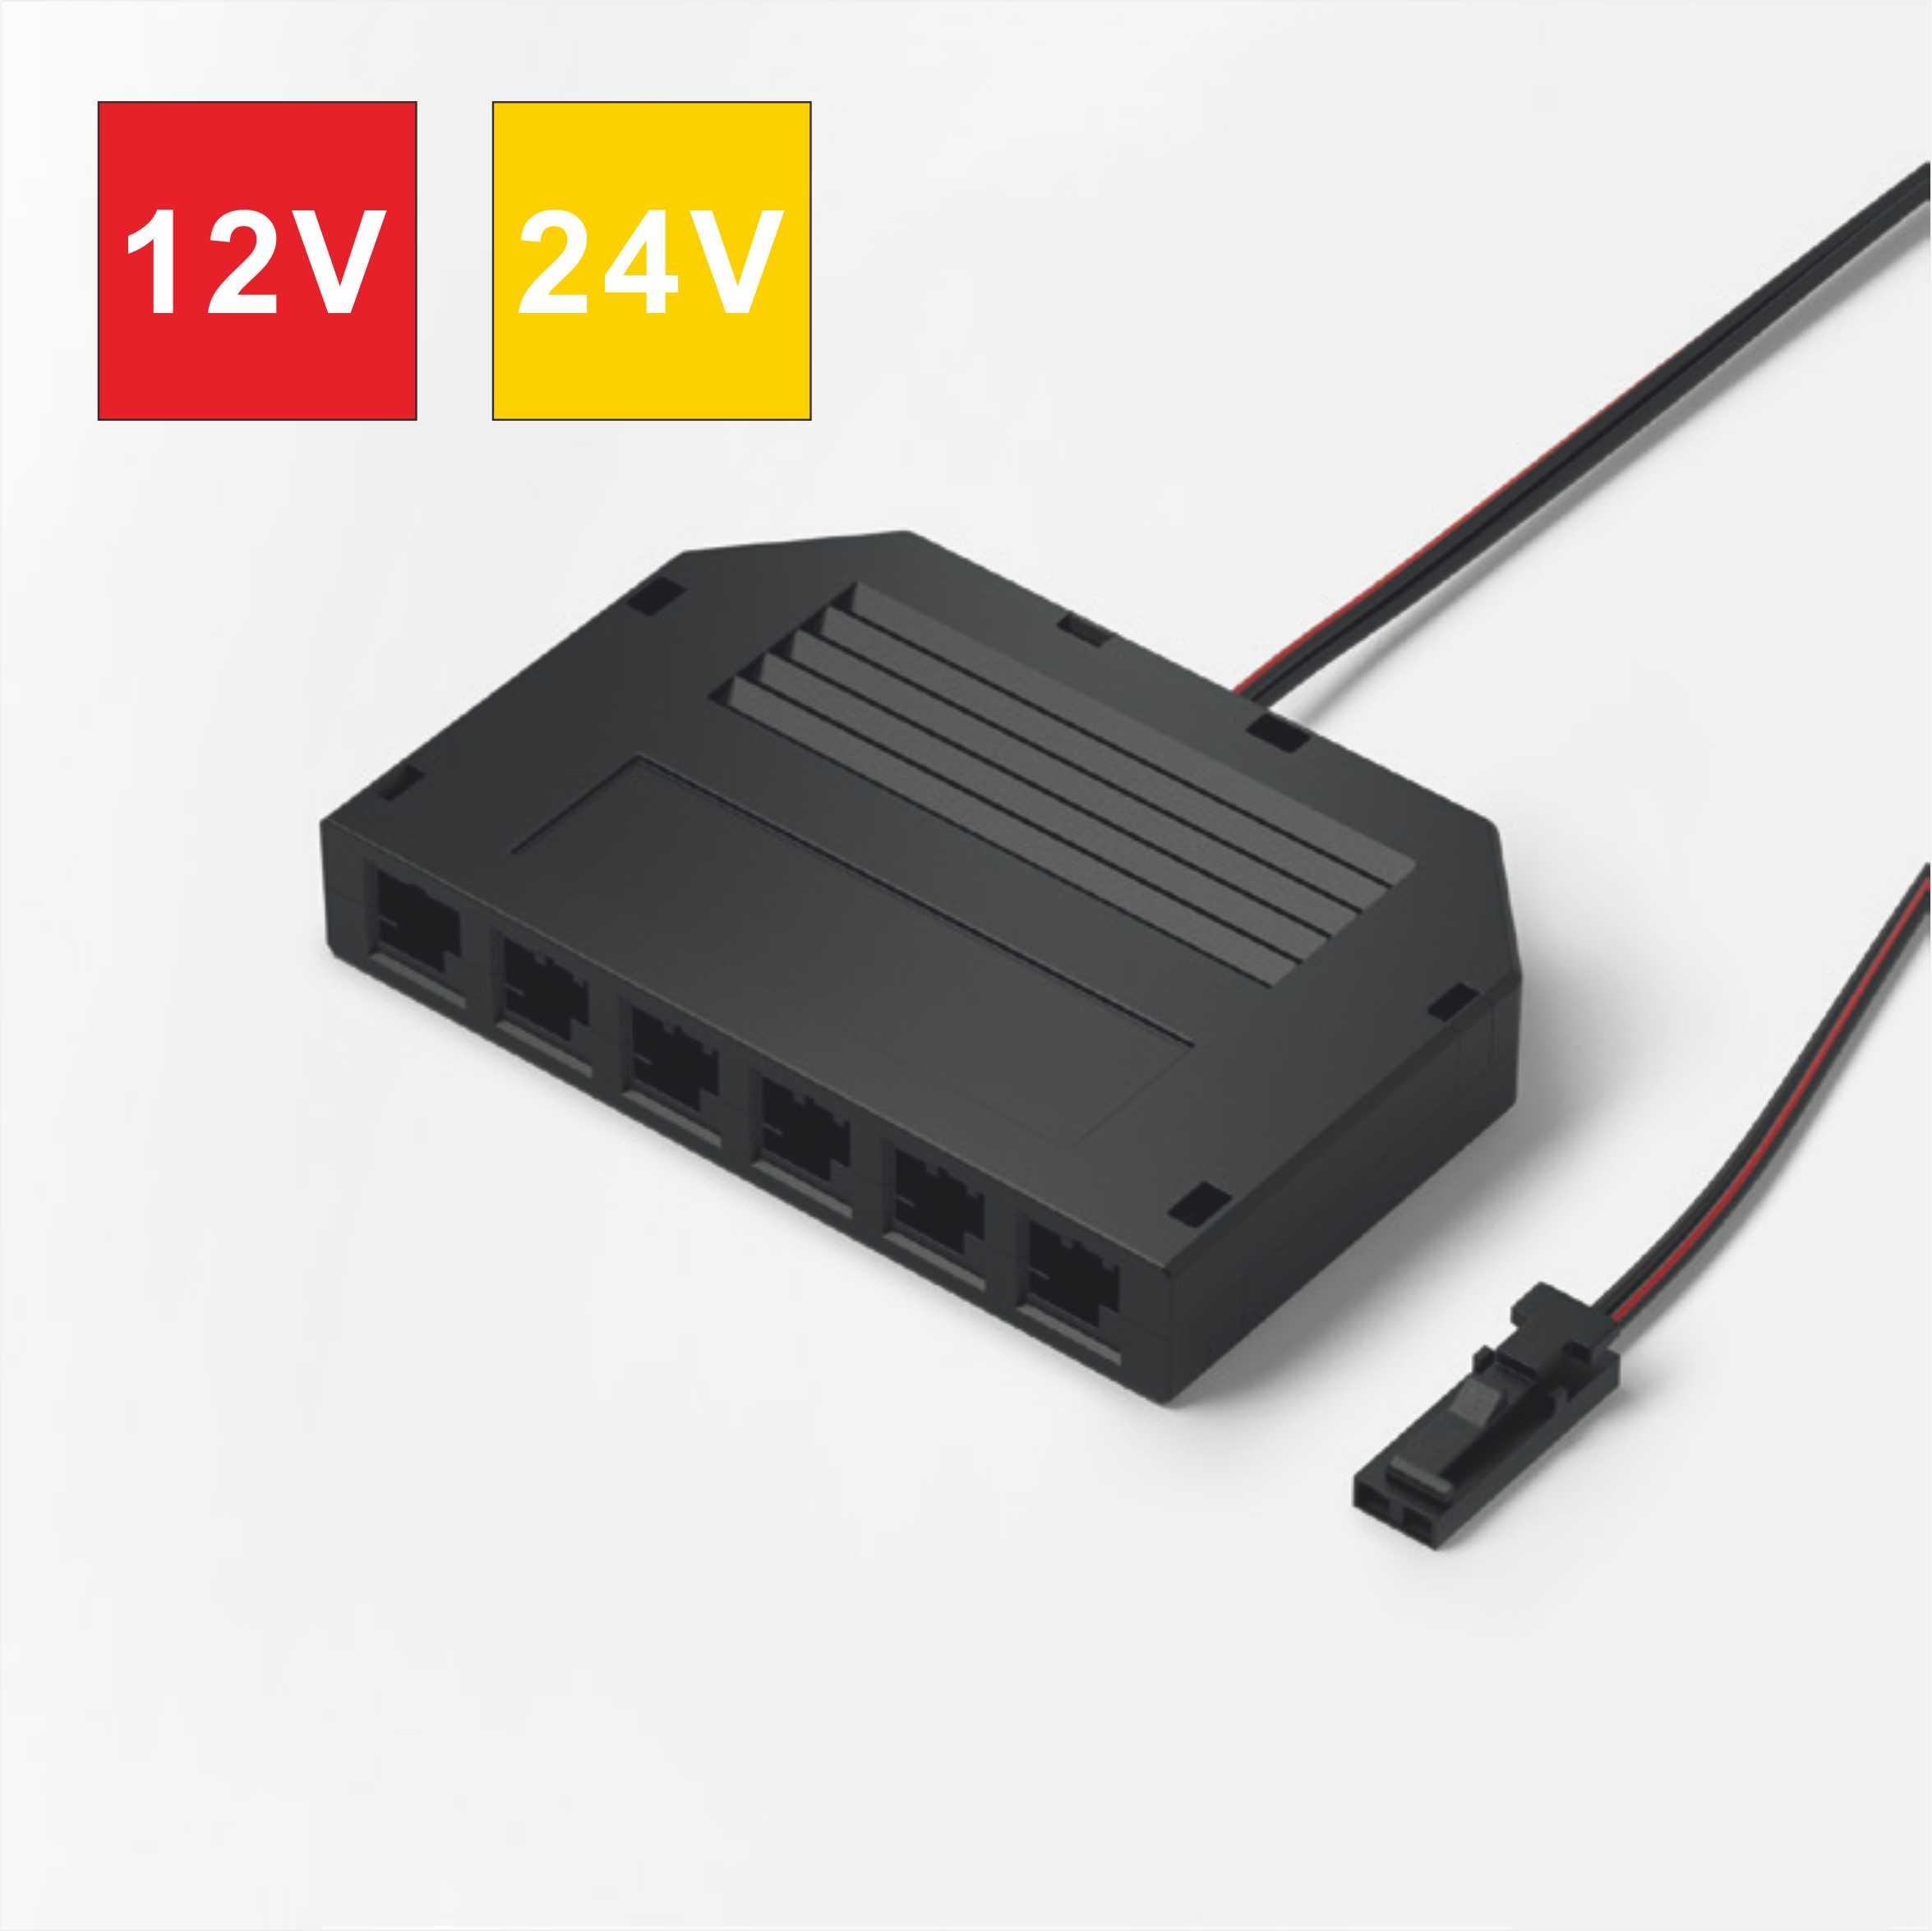 12V/24V 3A LED Mini 6-Way Distributor for Constant Voltage Lightings 9518.062